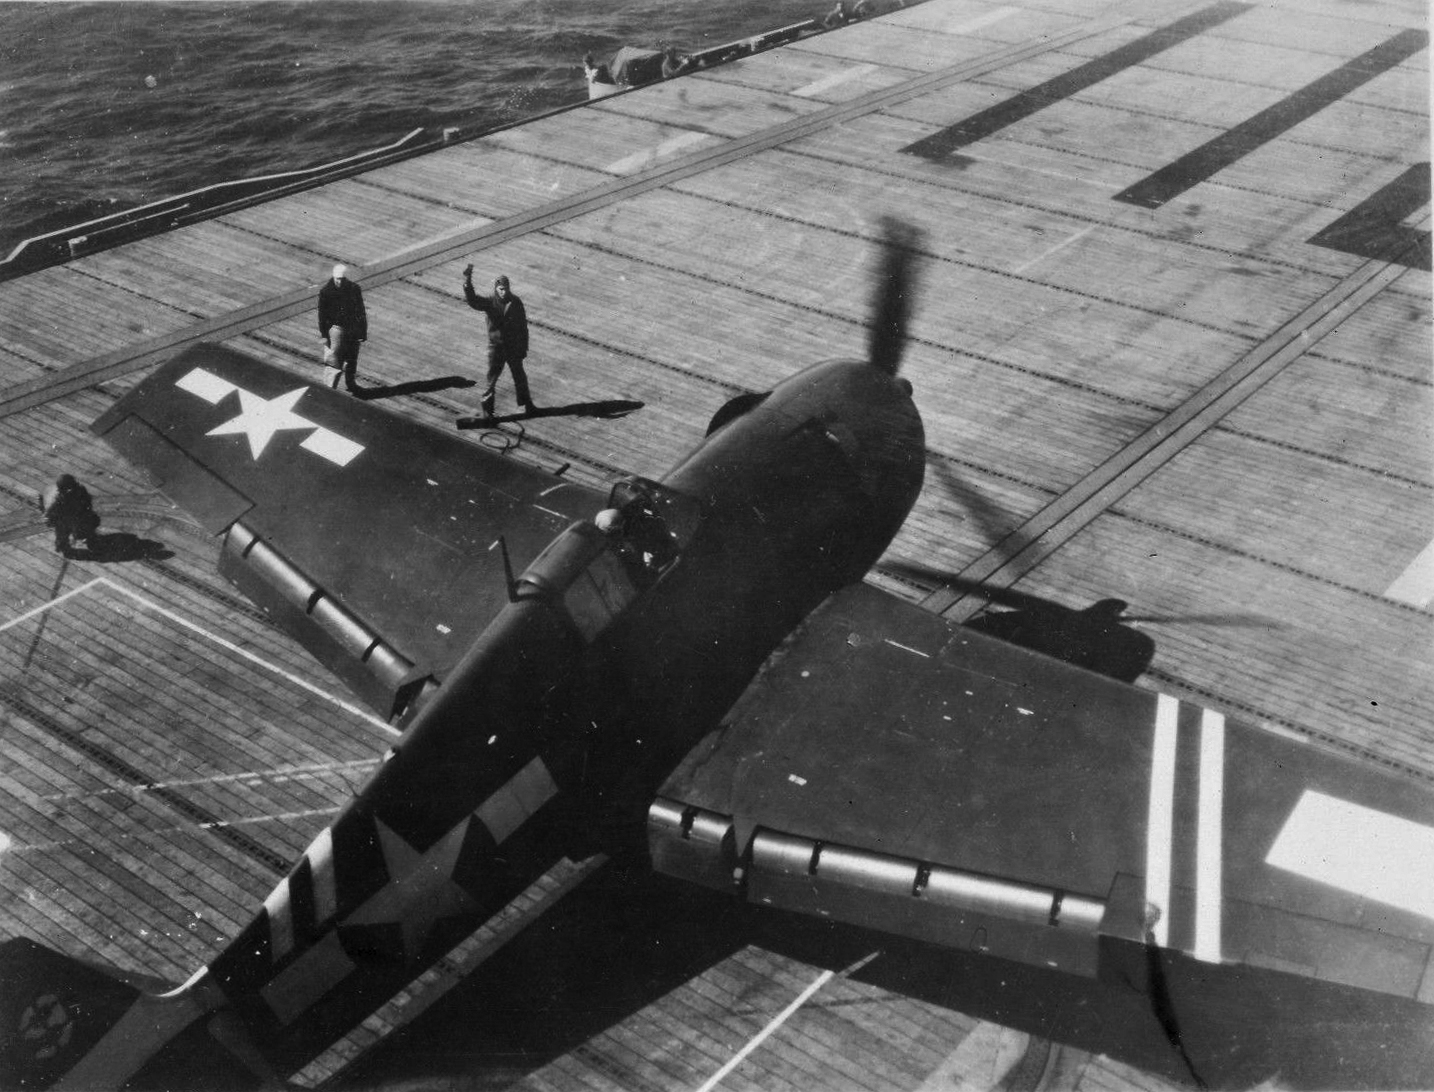 Grumman F6F 5 Hellcat VF 36 White 9 pre launch CVE 112 USS Siboney Aug 1945 May 1946 01